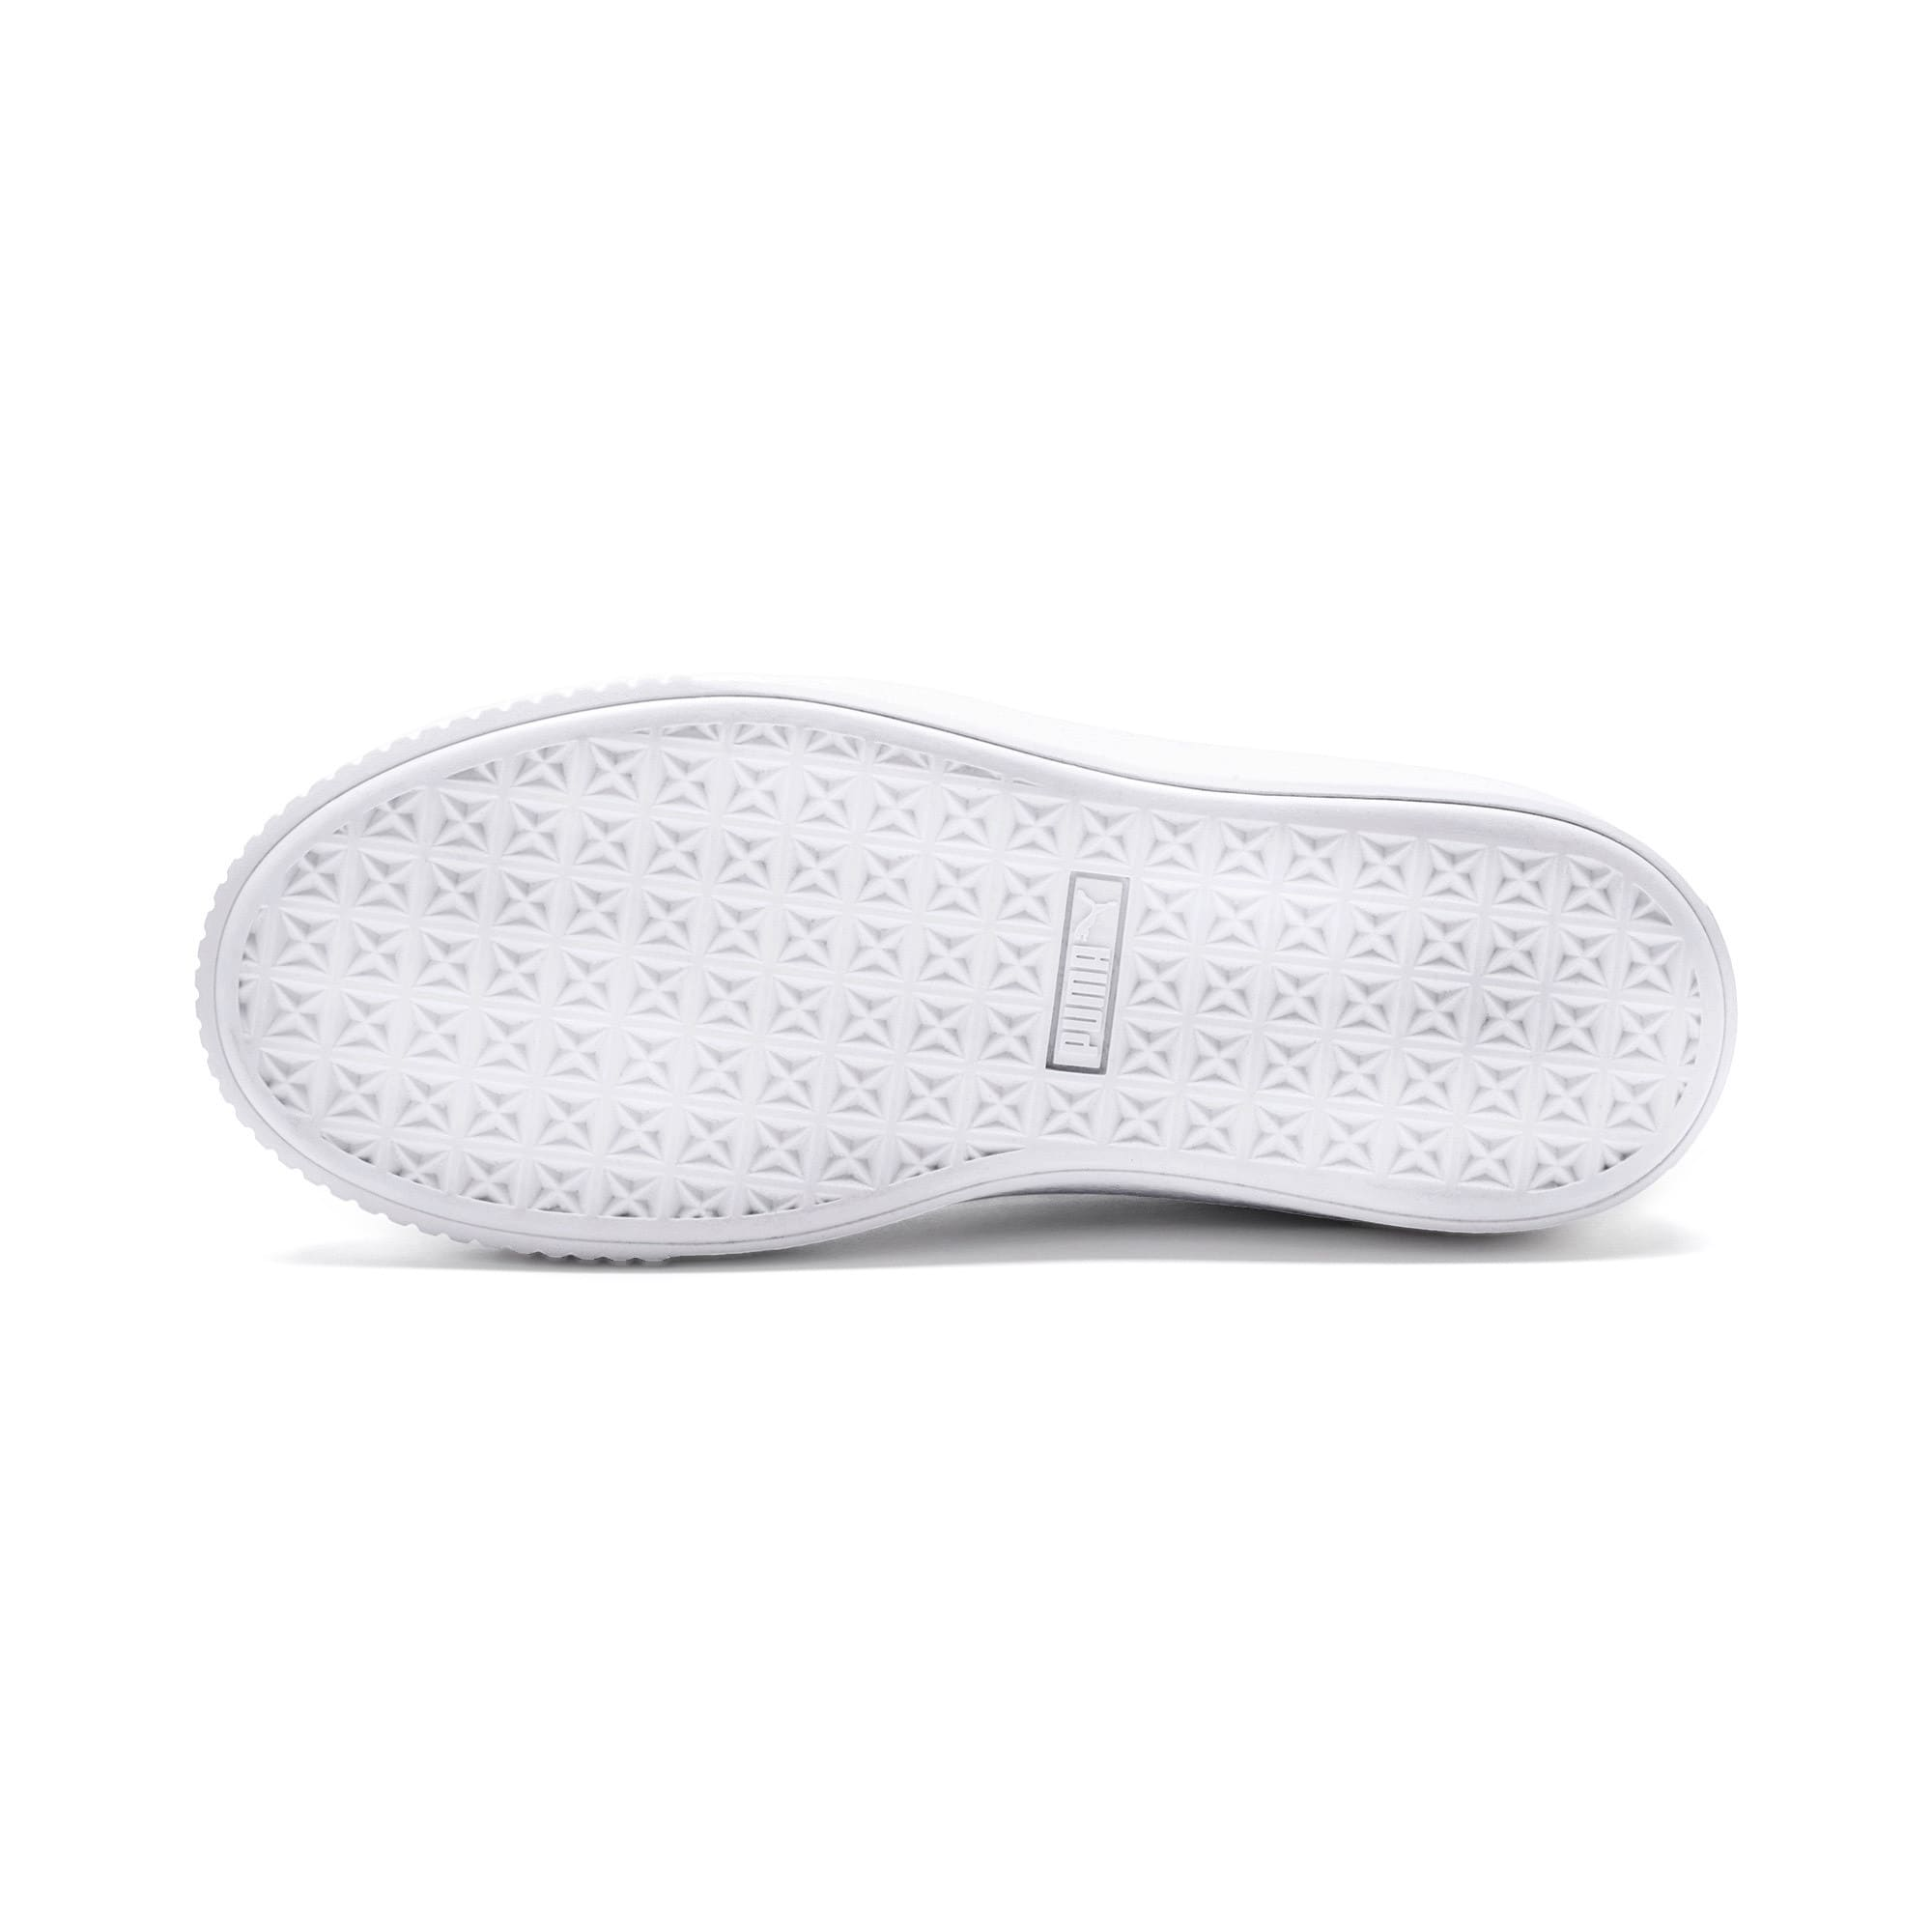 Thumbnail 3 of Basket Platform Twilight Women's Sneakers, Puma White-Sweet Lavender, medium